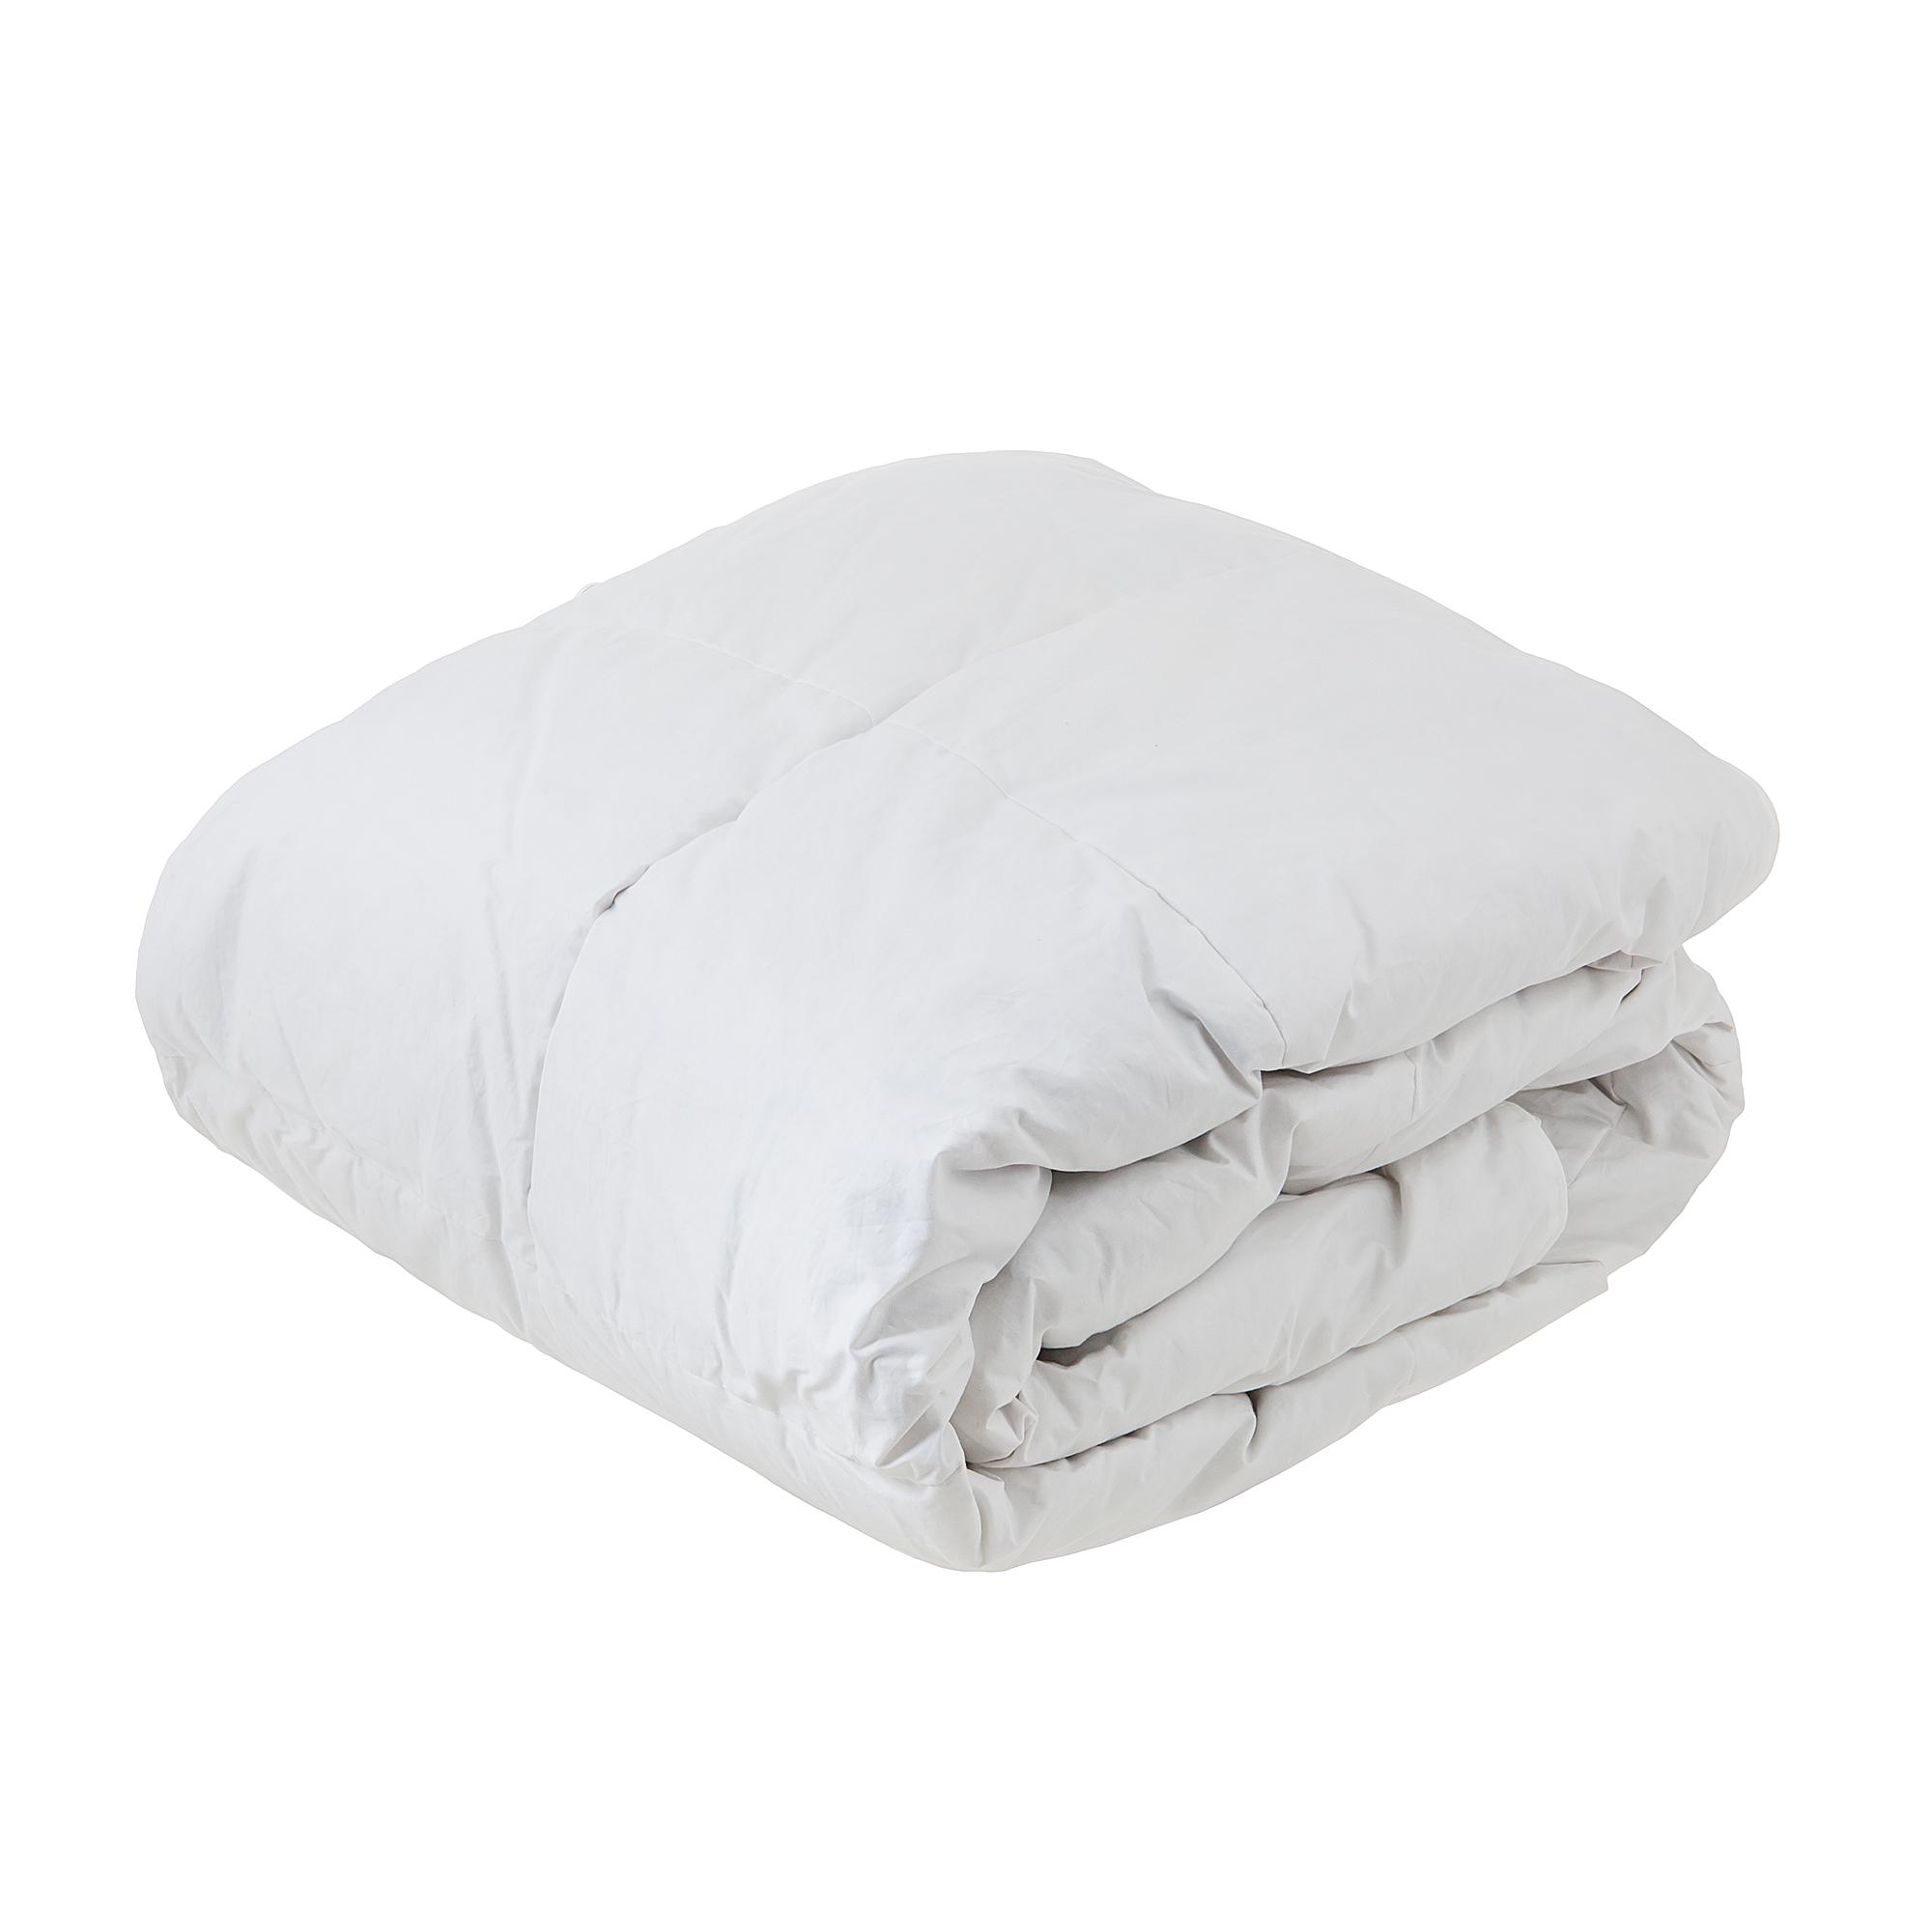 Фото - Одеяло кассетное 960 140x205 Belashoff silver col одеяло кассетное 960 200x220 belashoff silver col